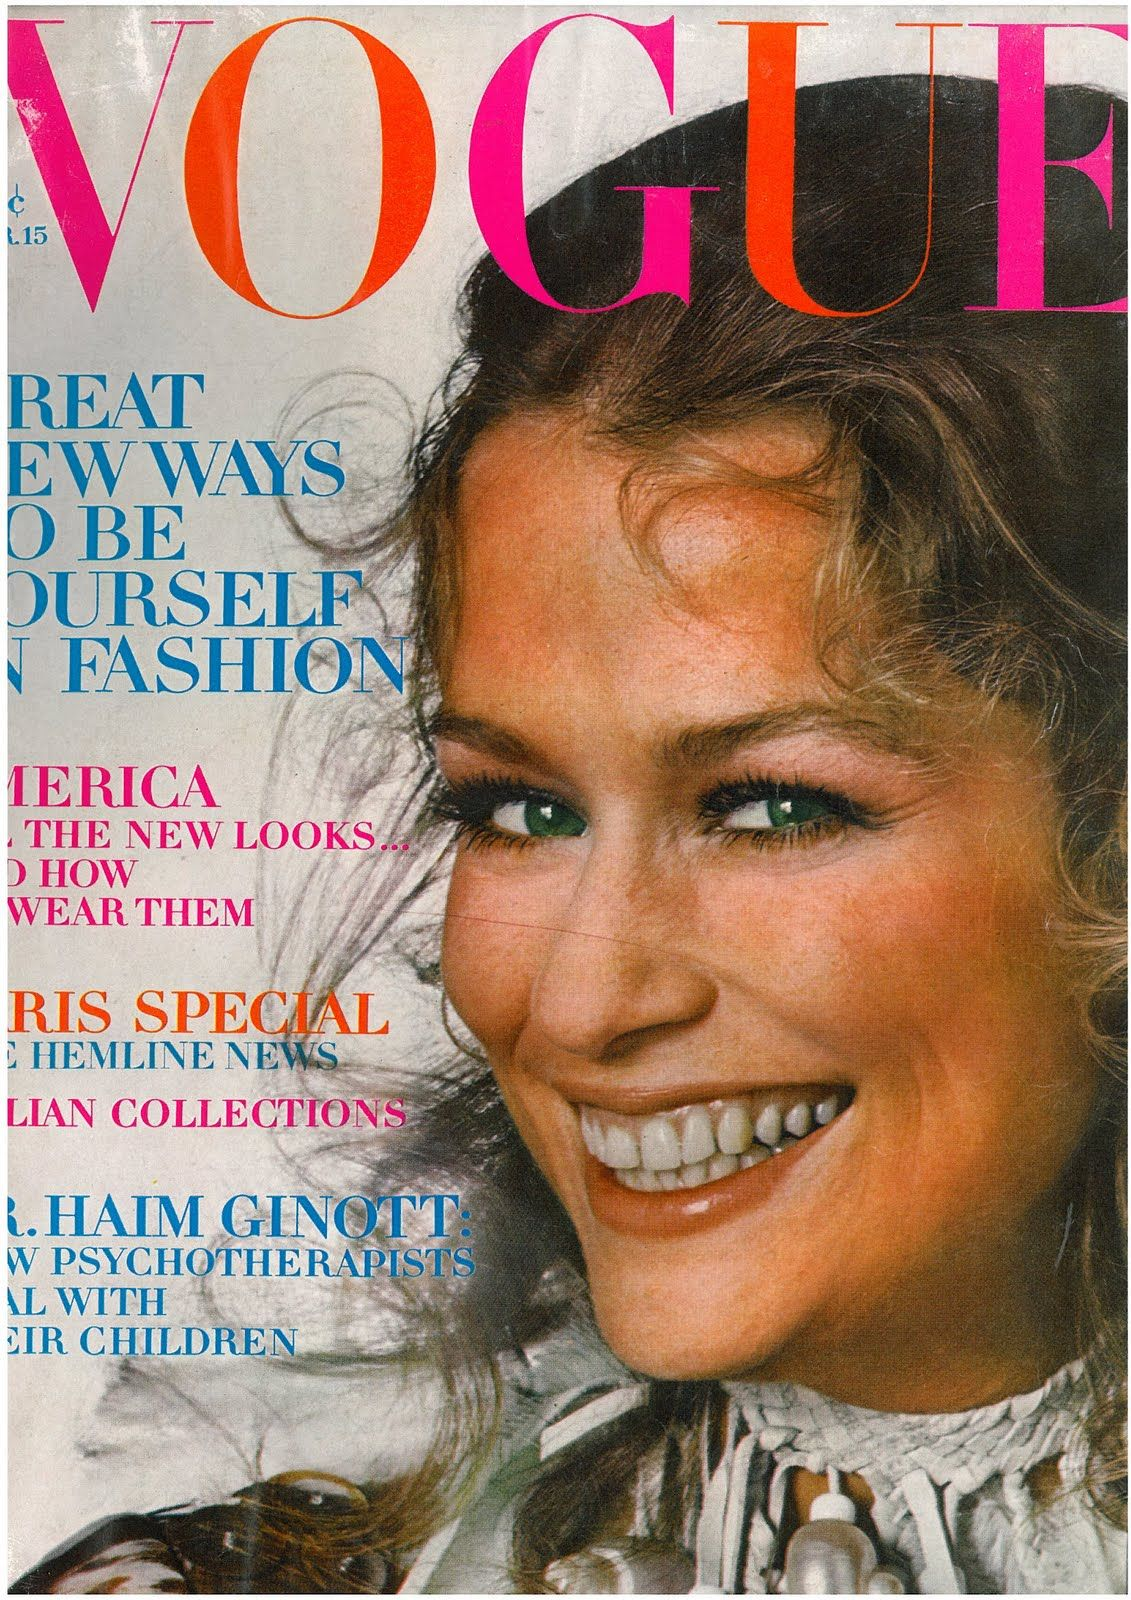 Lauren Hutton. Photo by Irving Penn. Vogue, March 15, 1970